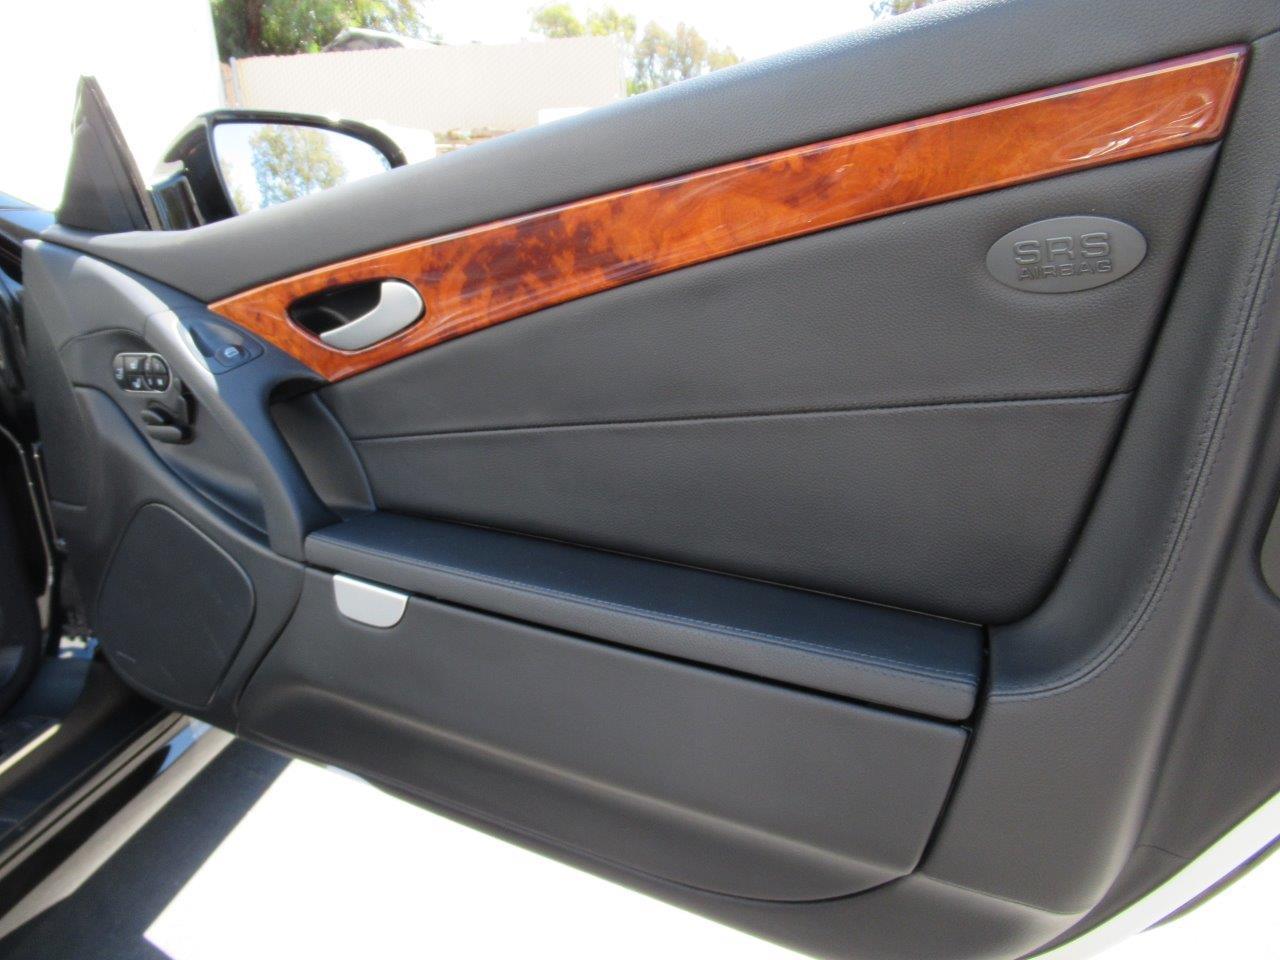 2011 Mercedes-Benz SL55 (CC-1344830) for sale in SIMI VALLEY, California